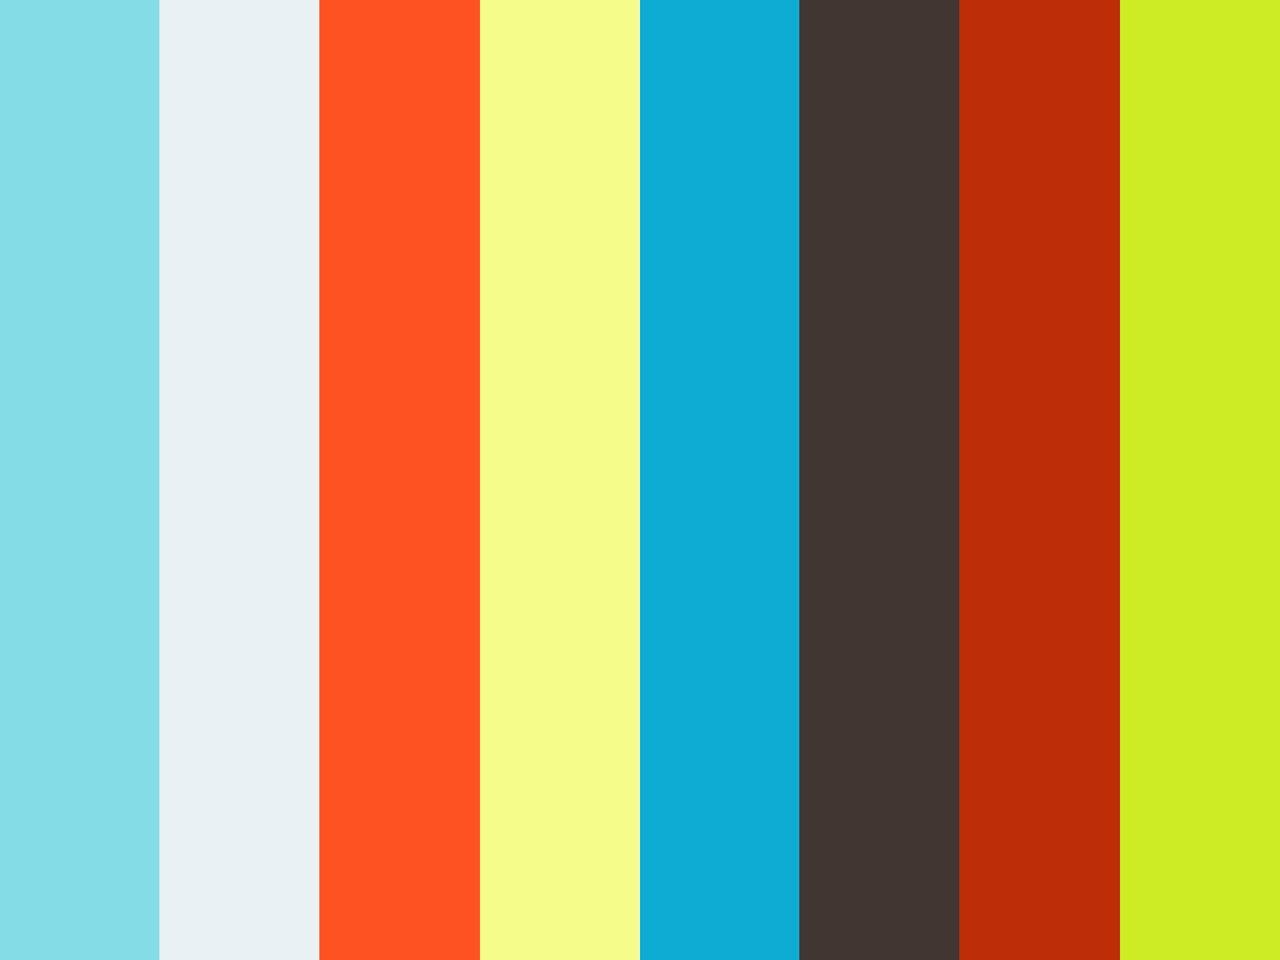 113 Branding Red Carpet TV Web Series Featuring Darla Claire